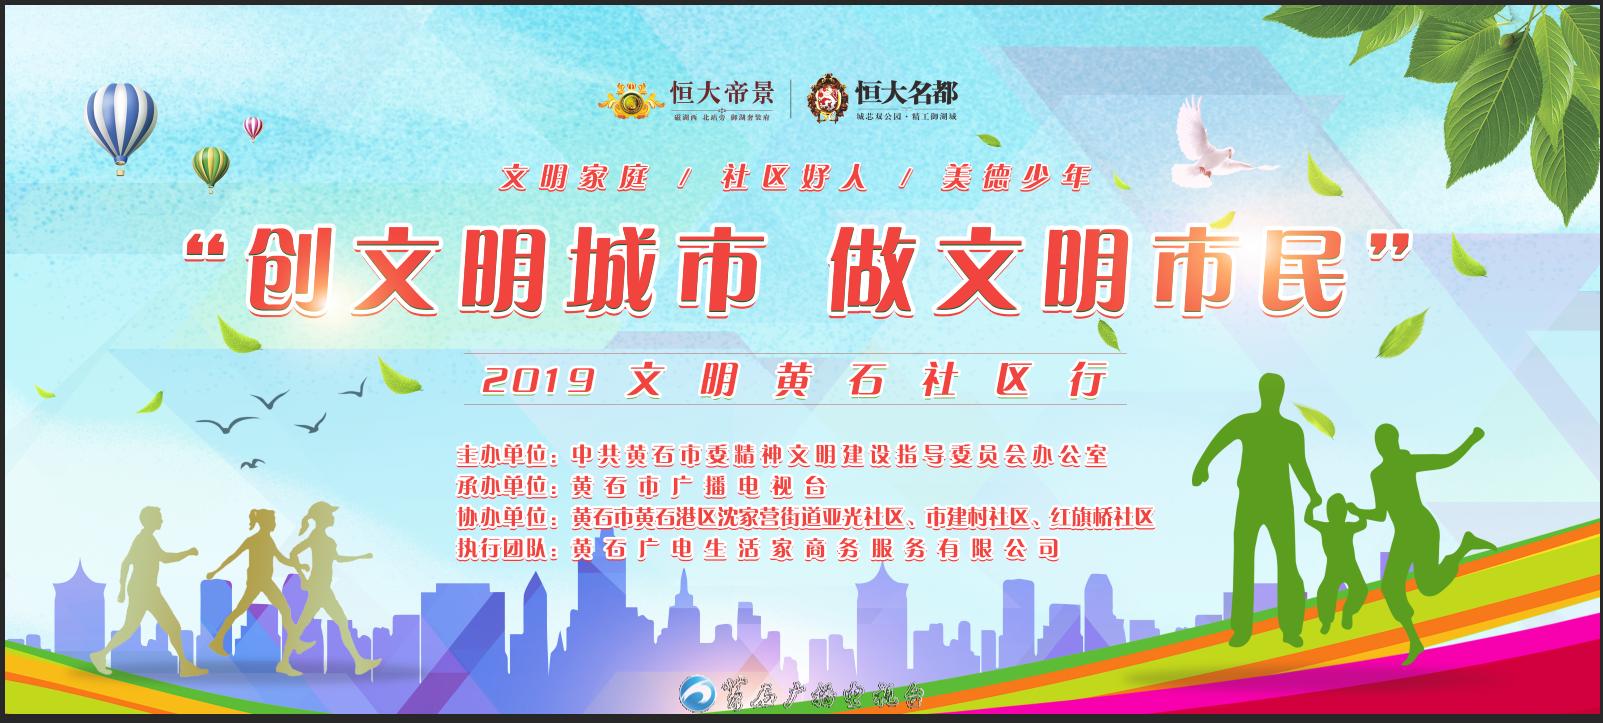 title='2019文明黄石社区行(沈家营街道)'